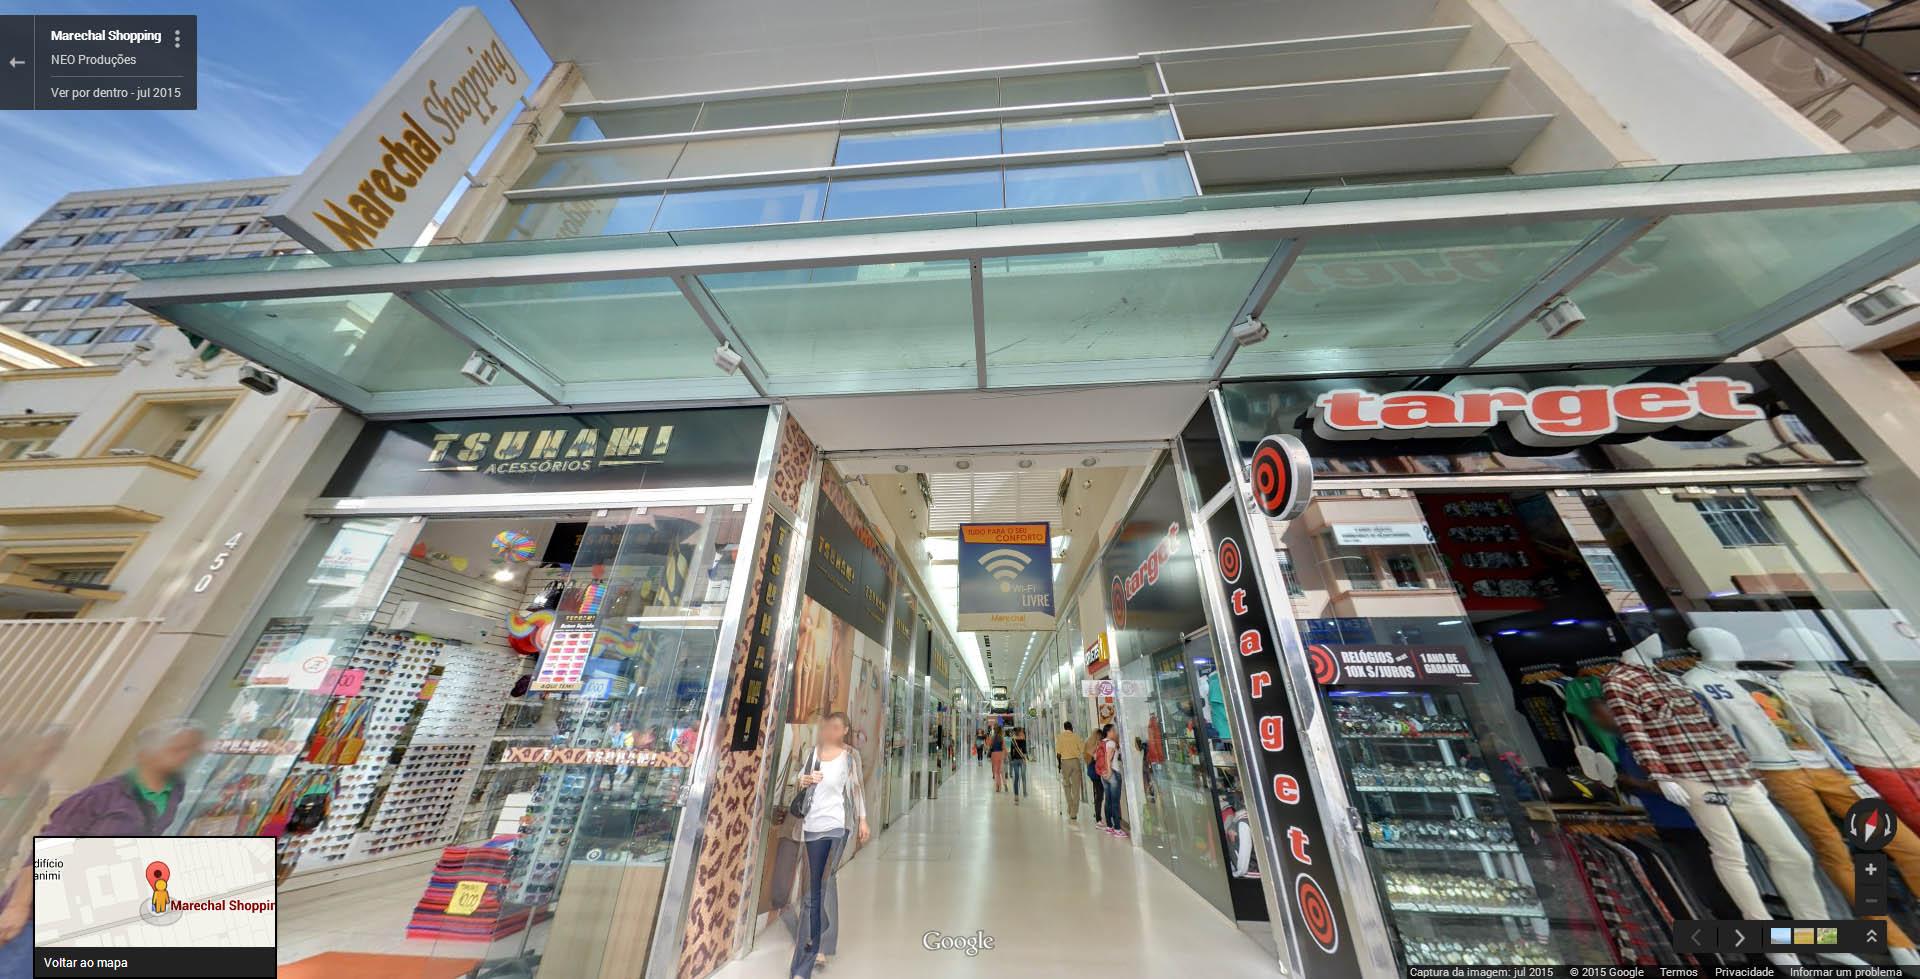 Marechal Shopping